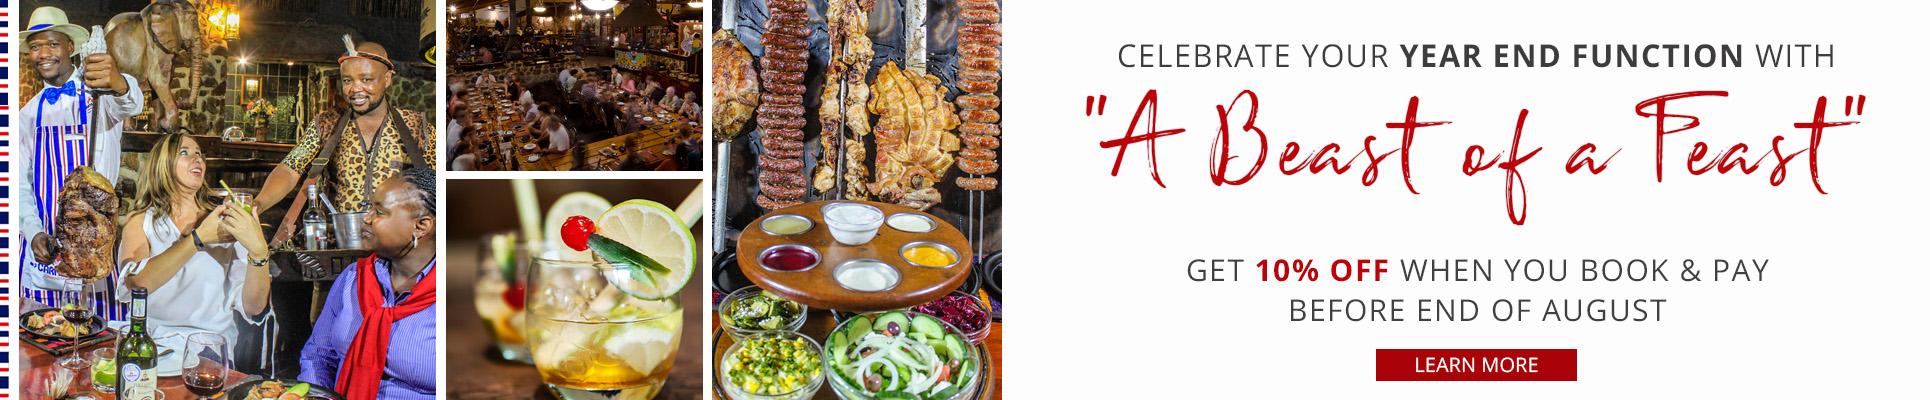 Carnivore Restaurant Year End Functions - Early Bird Specials in Muldersdrift, Gauteng